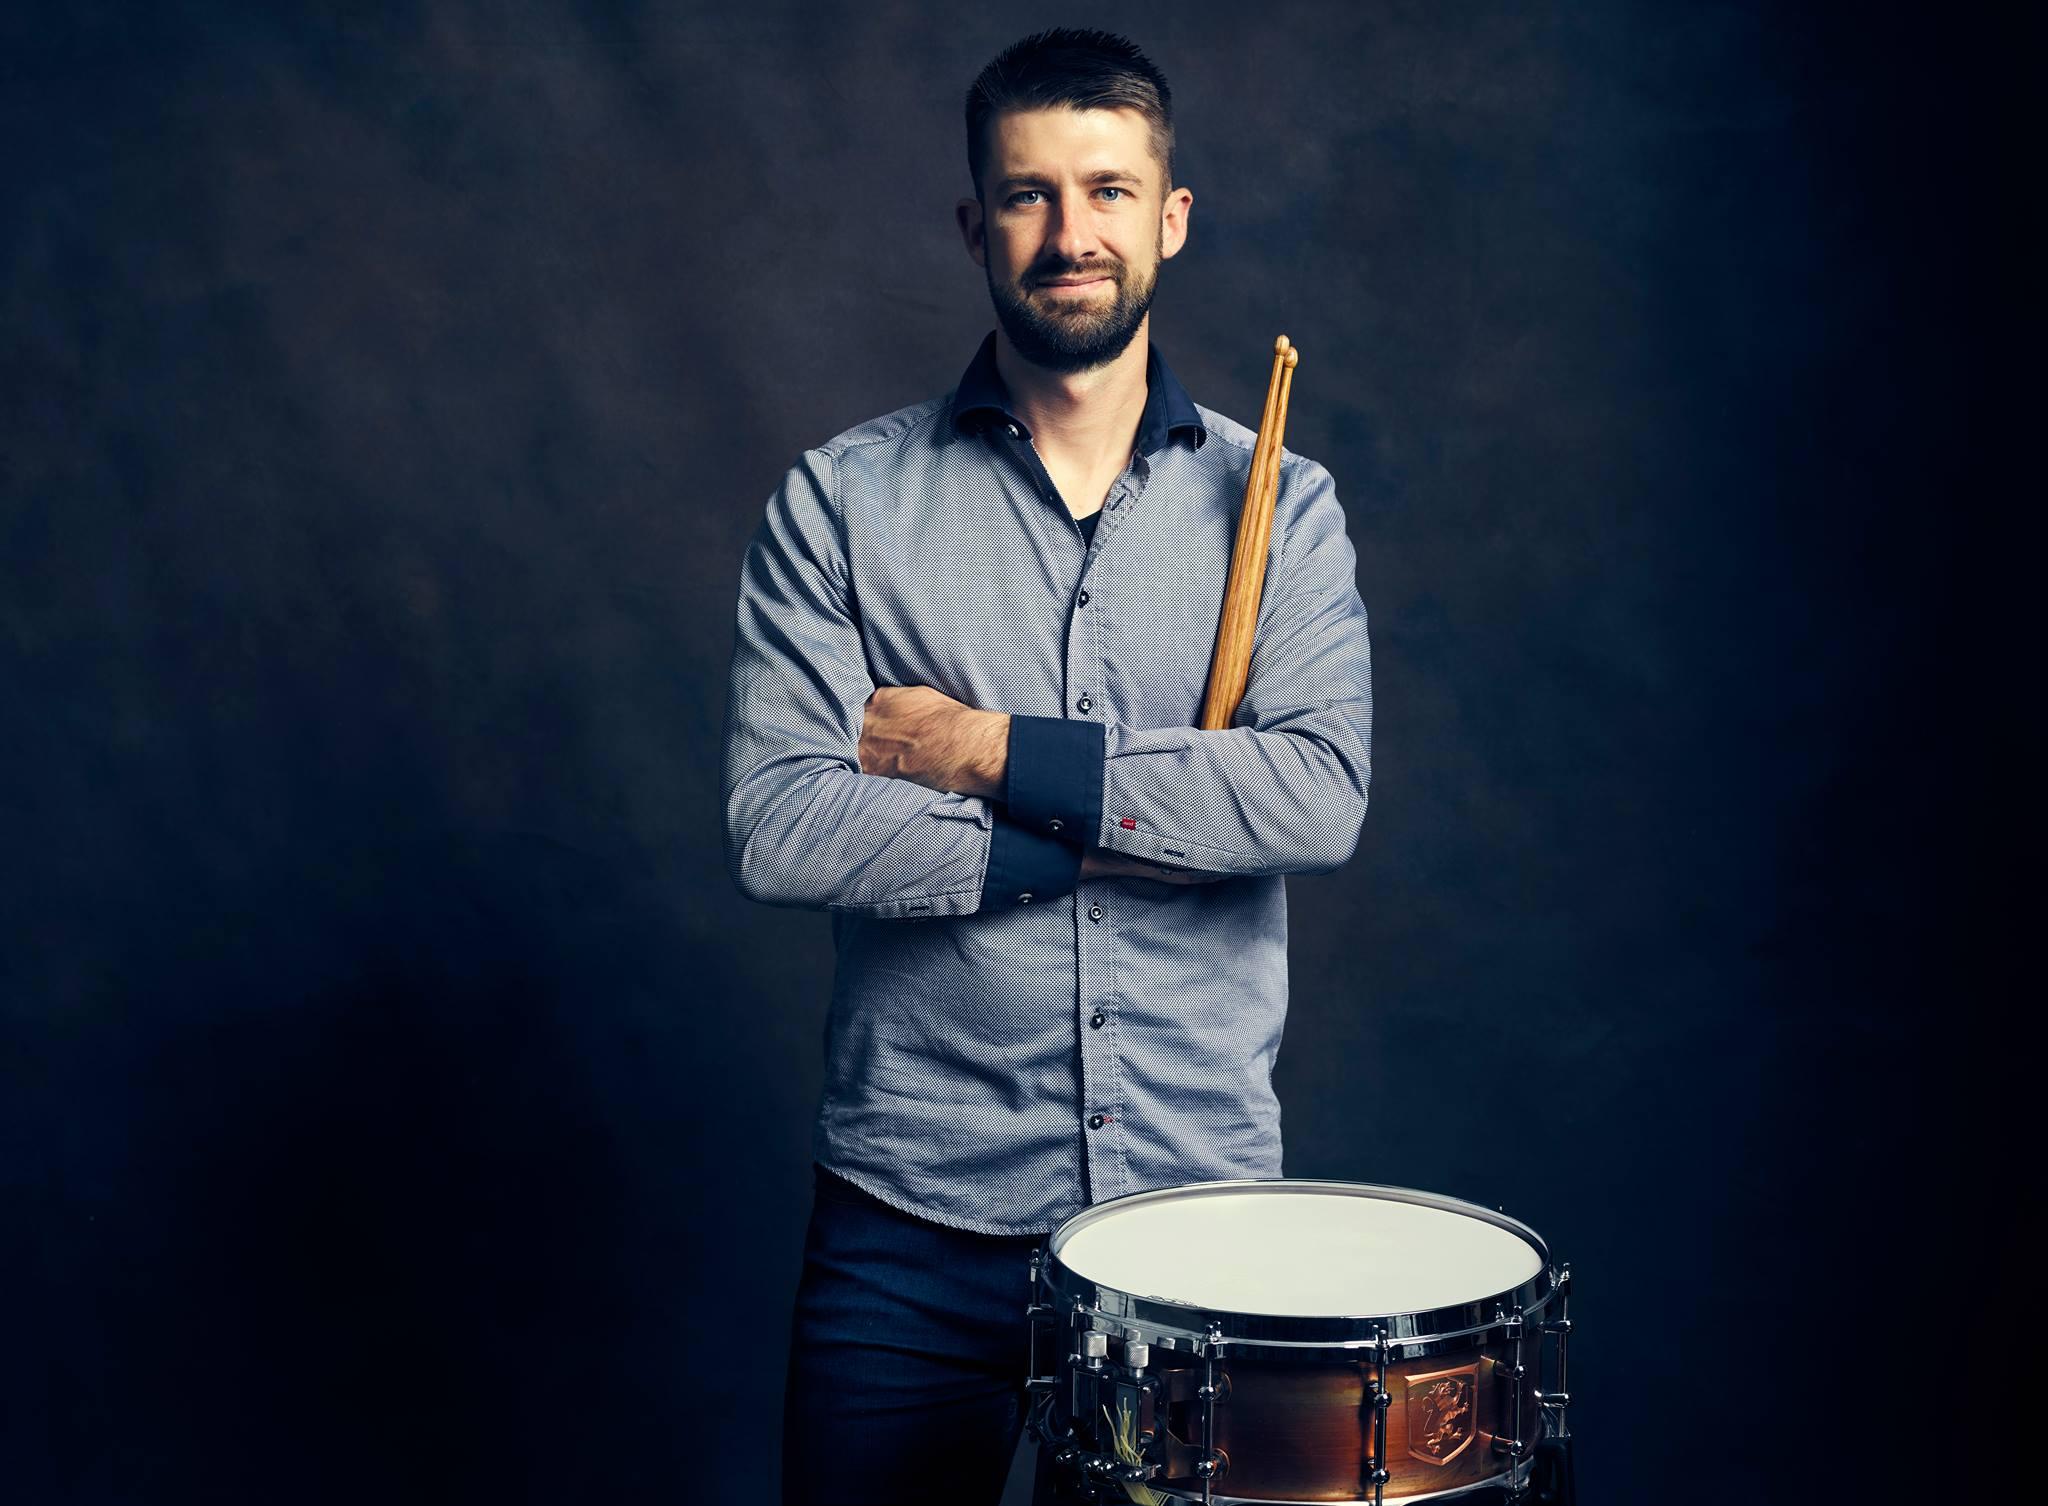 Michael Culligan, Percussion -